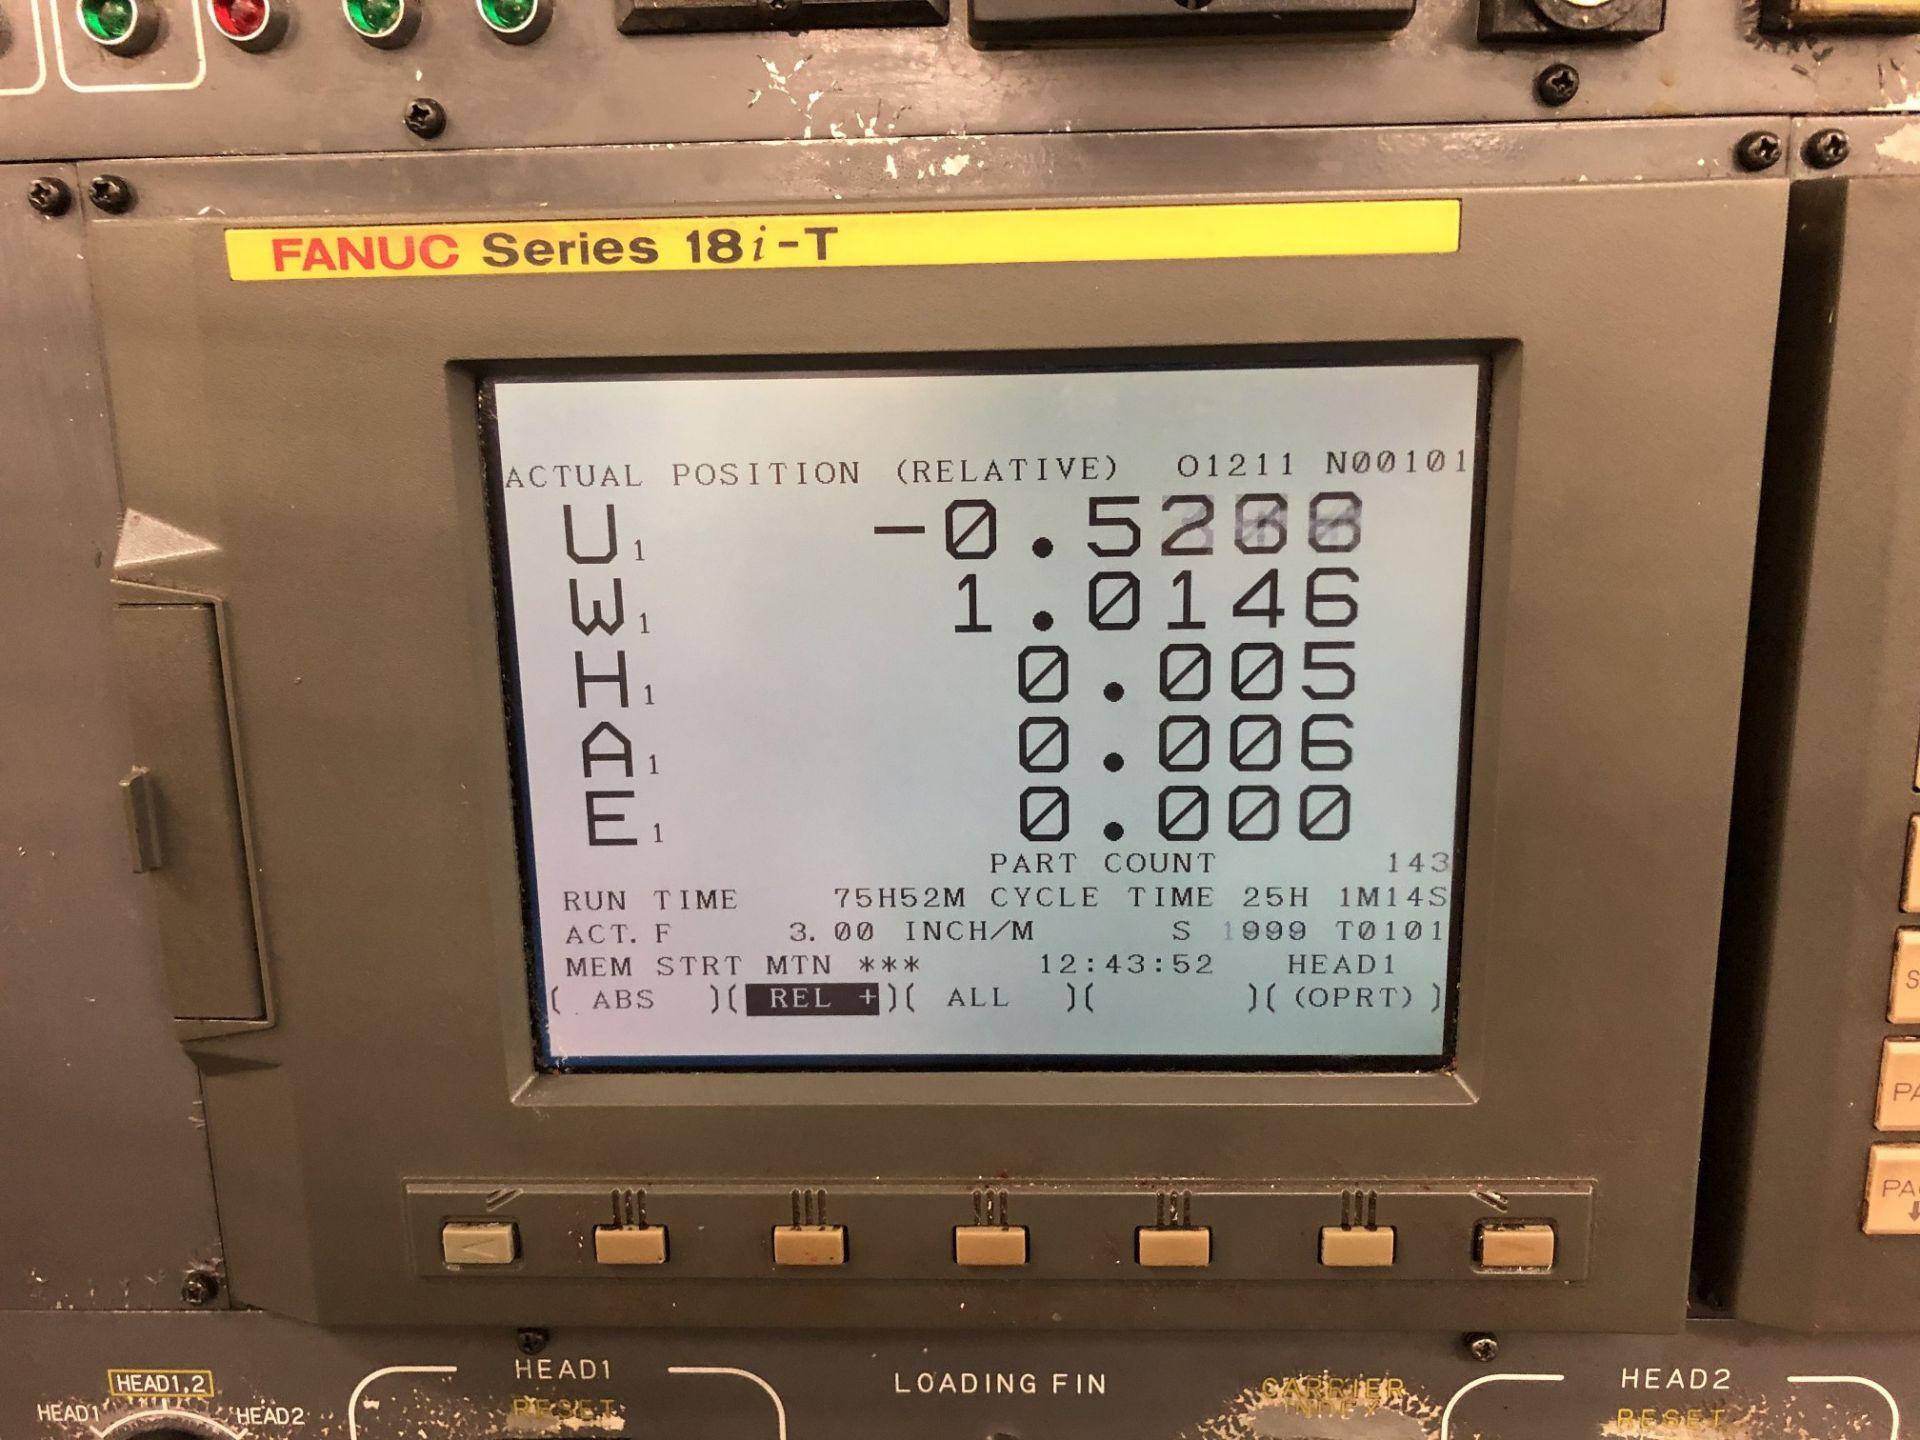 1999 Kitako MT4-200M Multi-Spindle CNC Turning Mill - Image 7 of 19